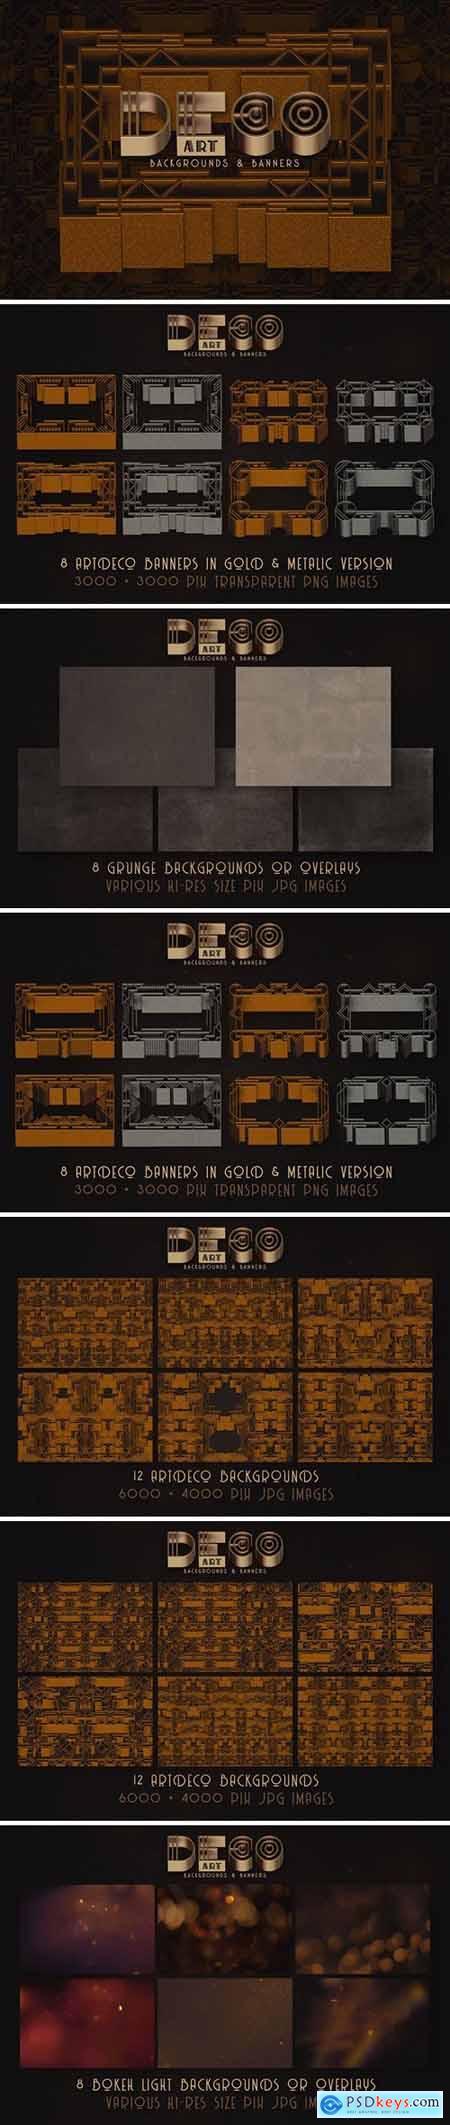 ArtDeco Backgrounds & Banners